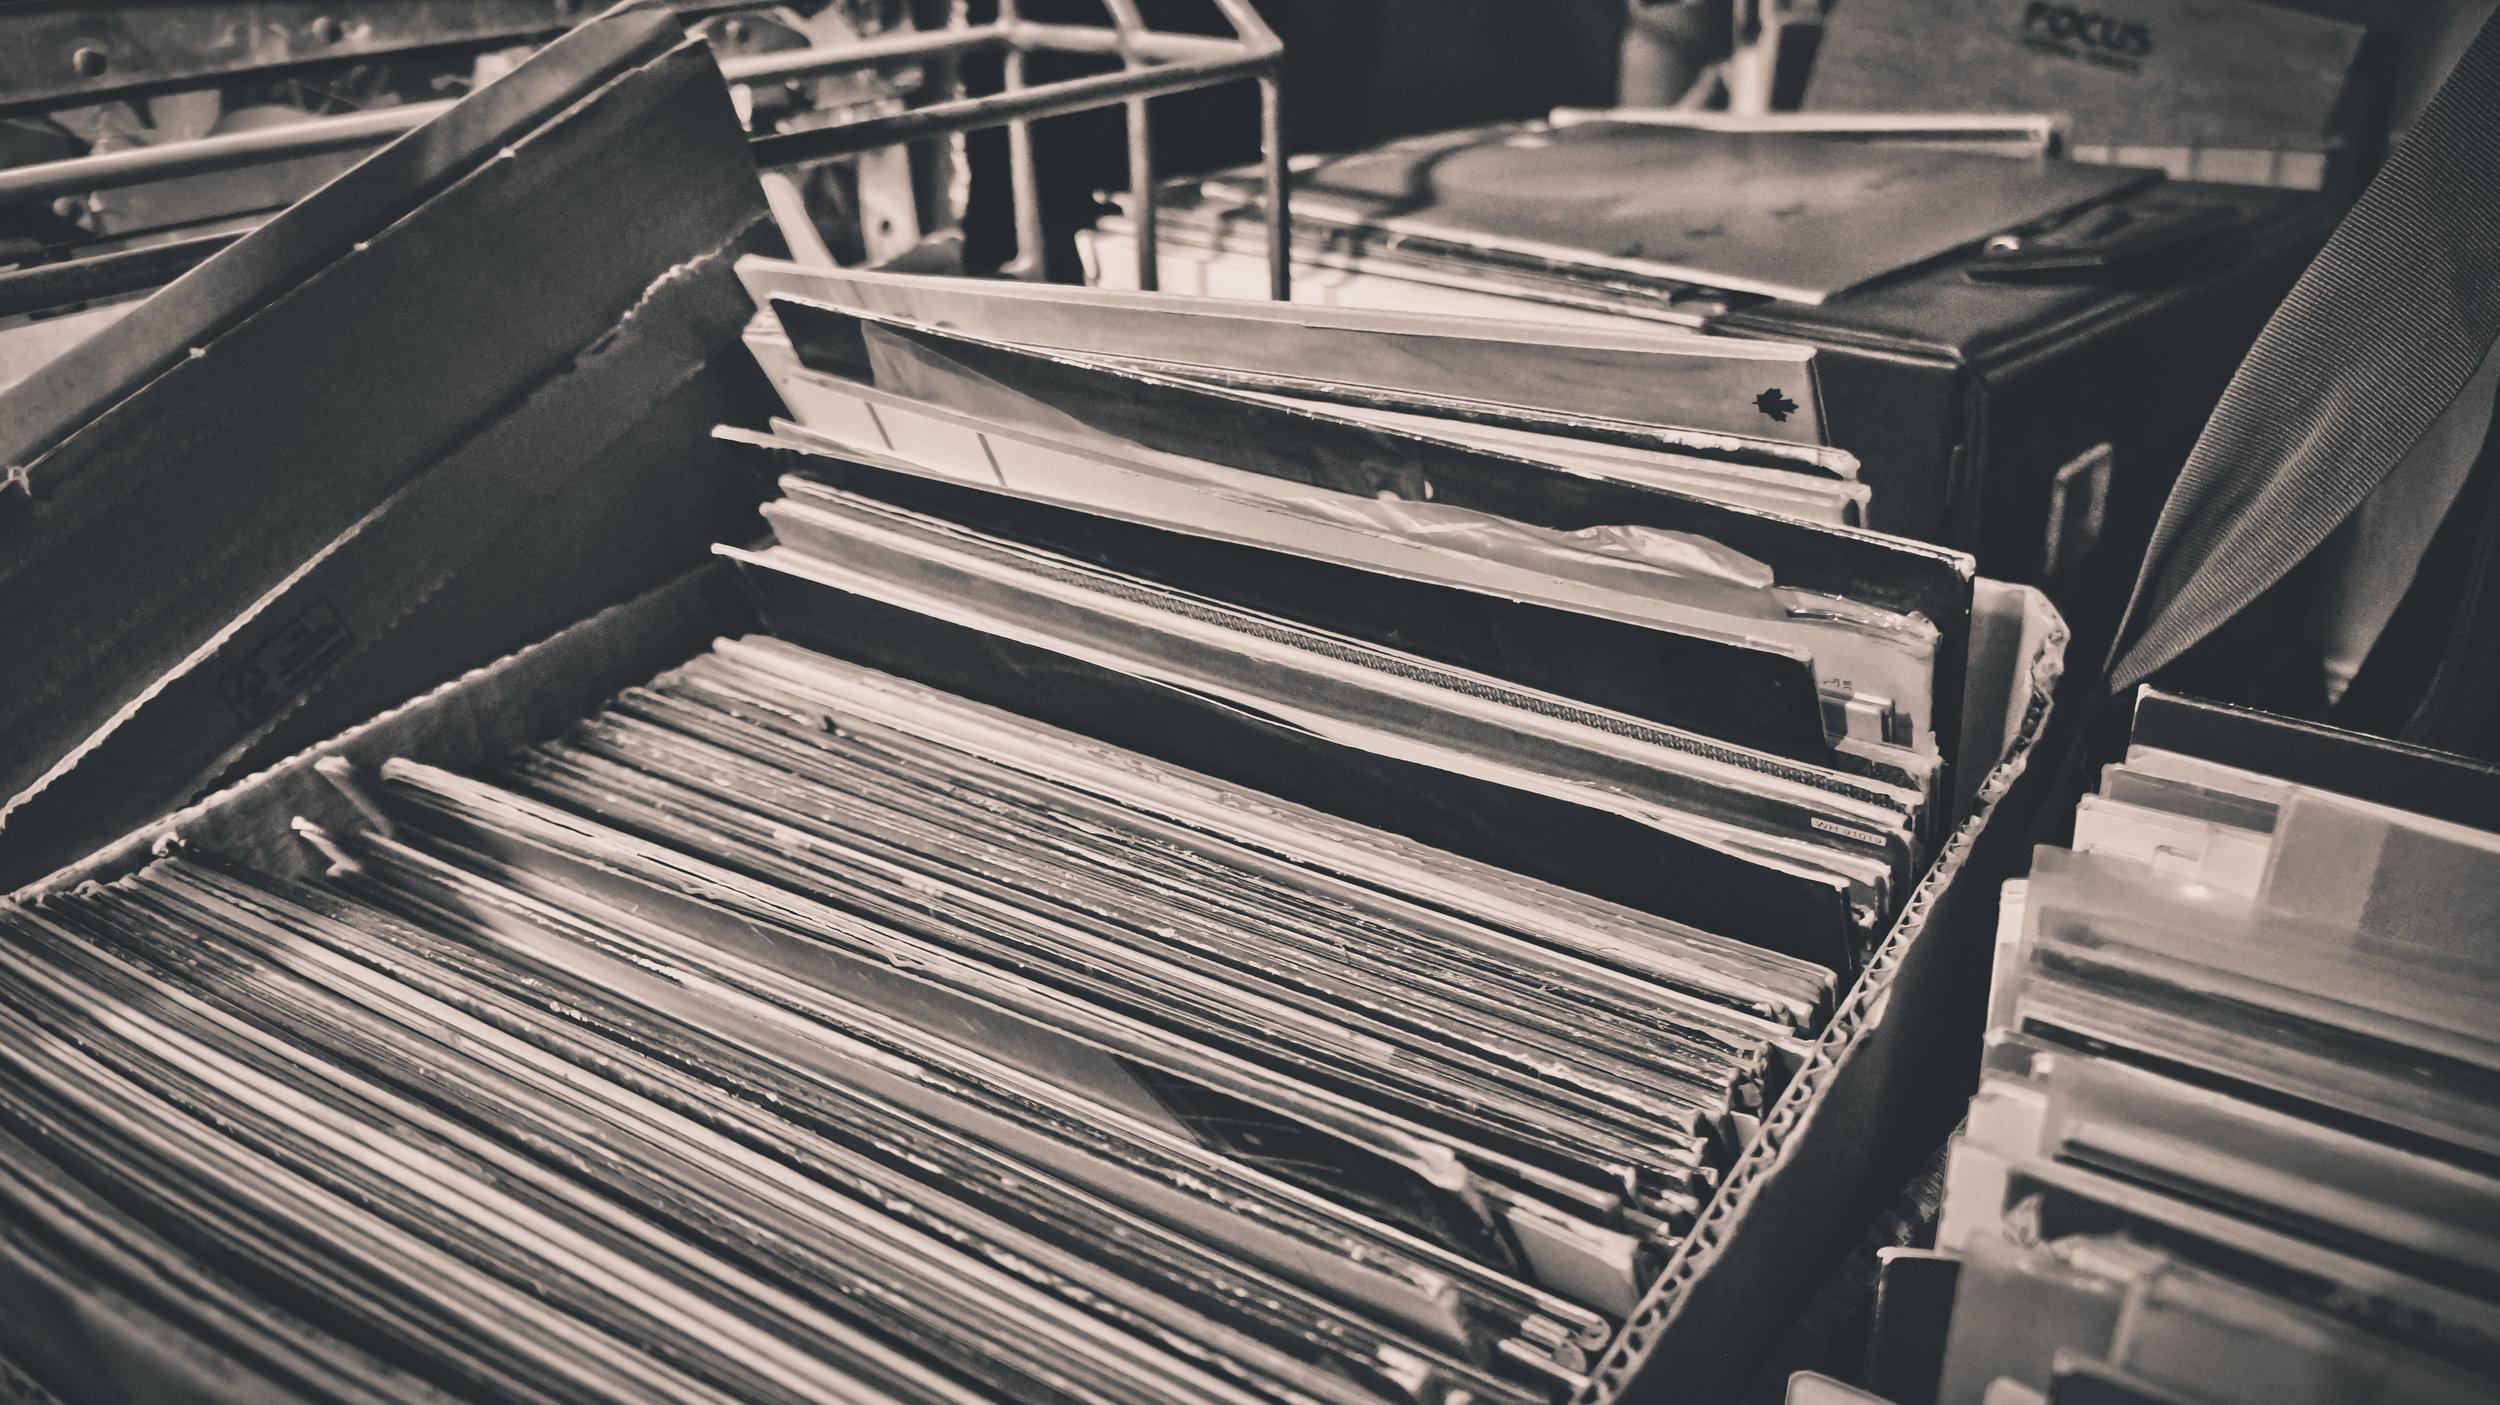 Iain Howie recordbox 2